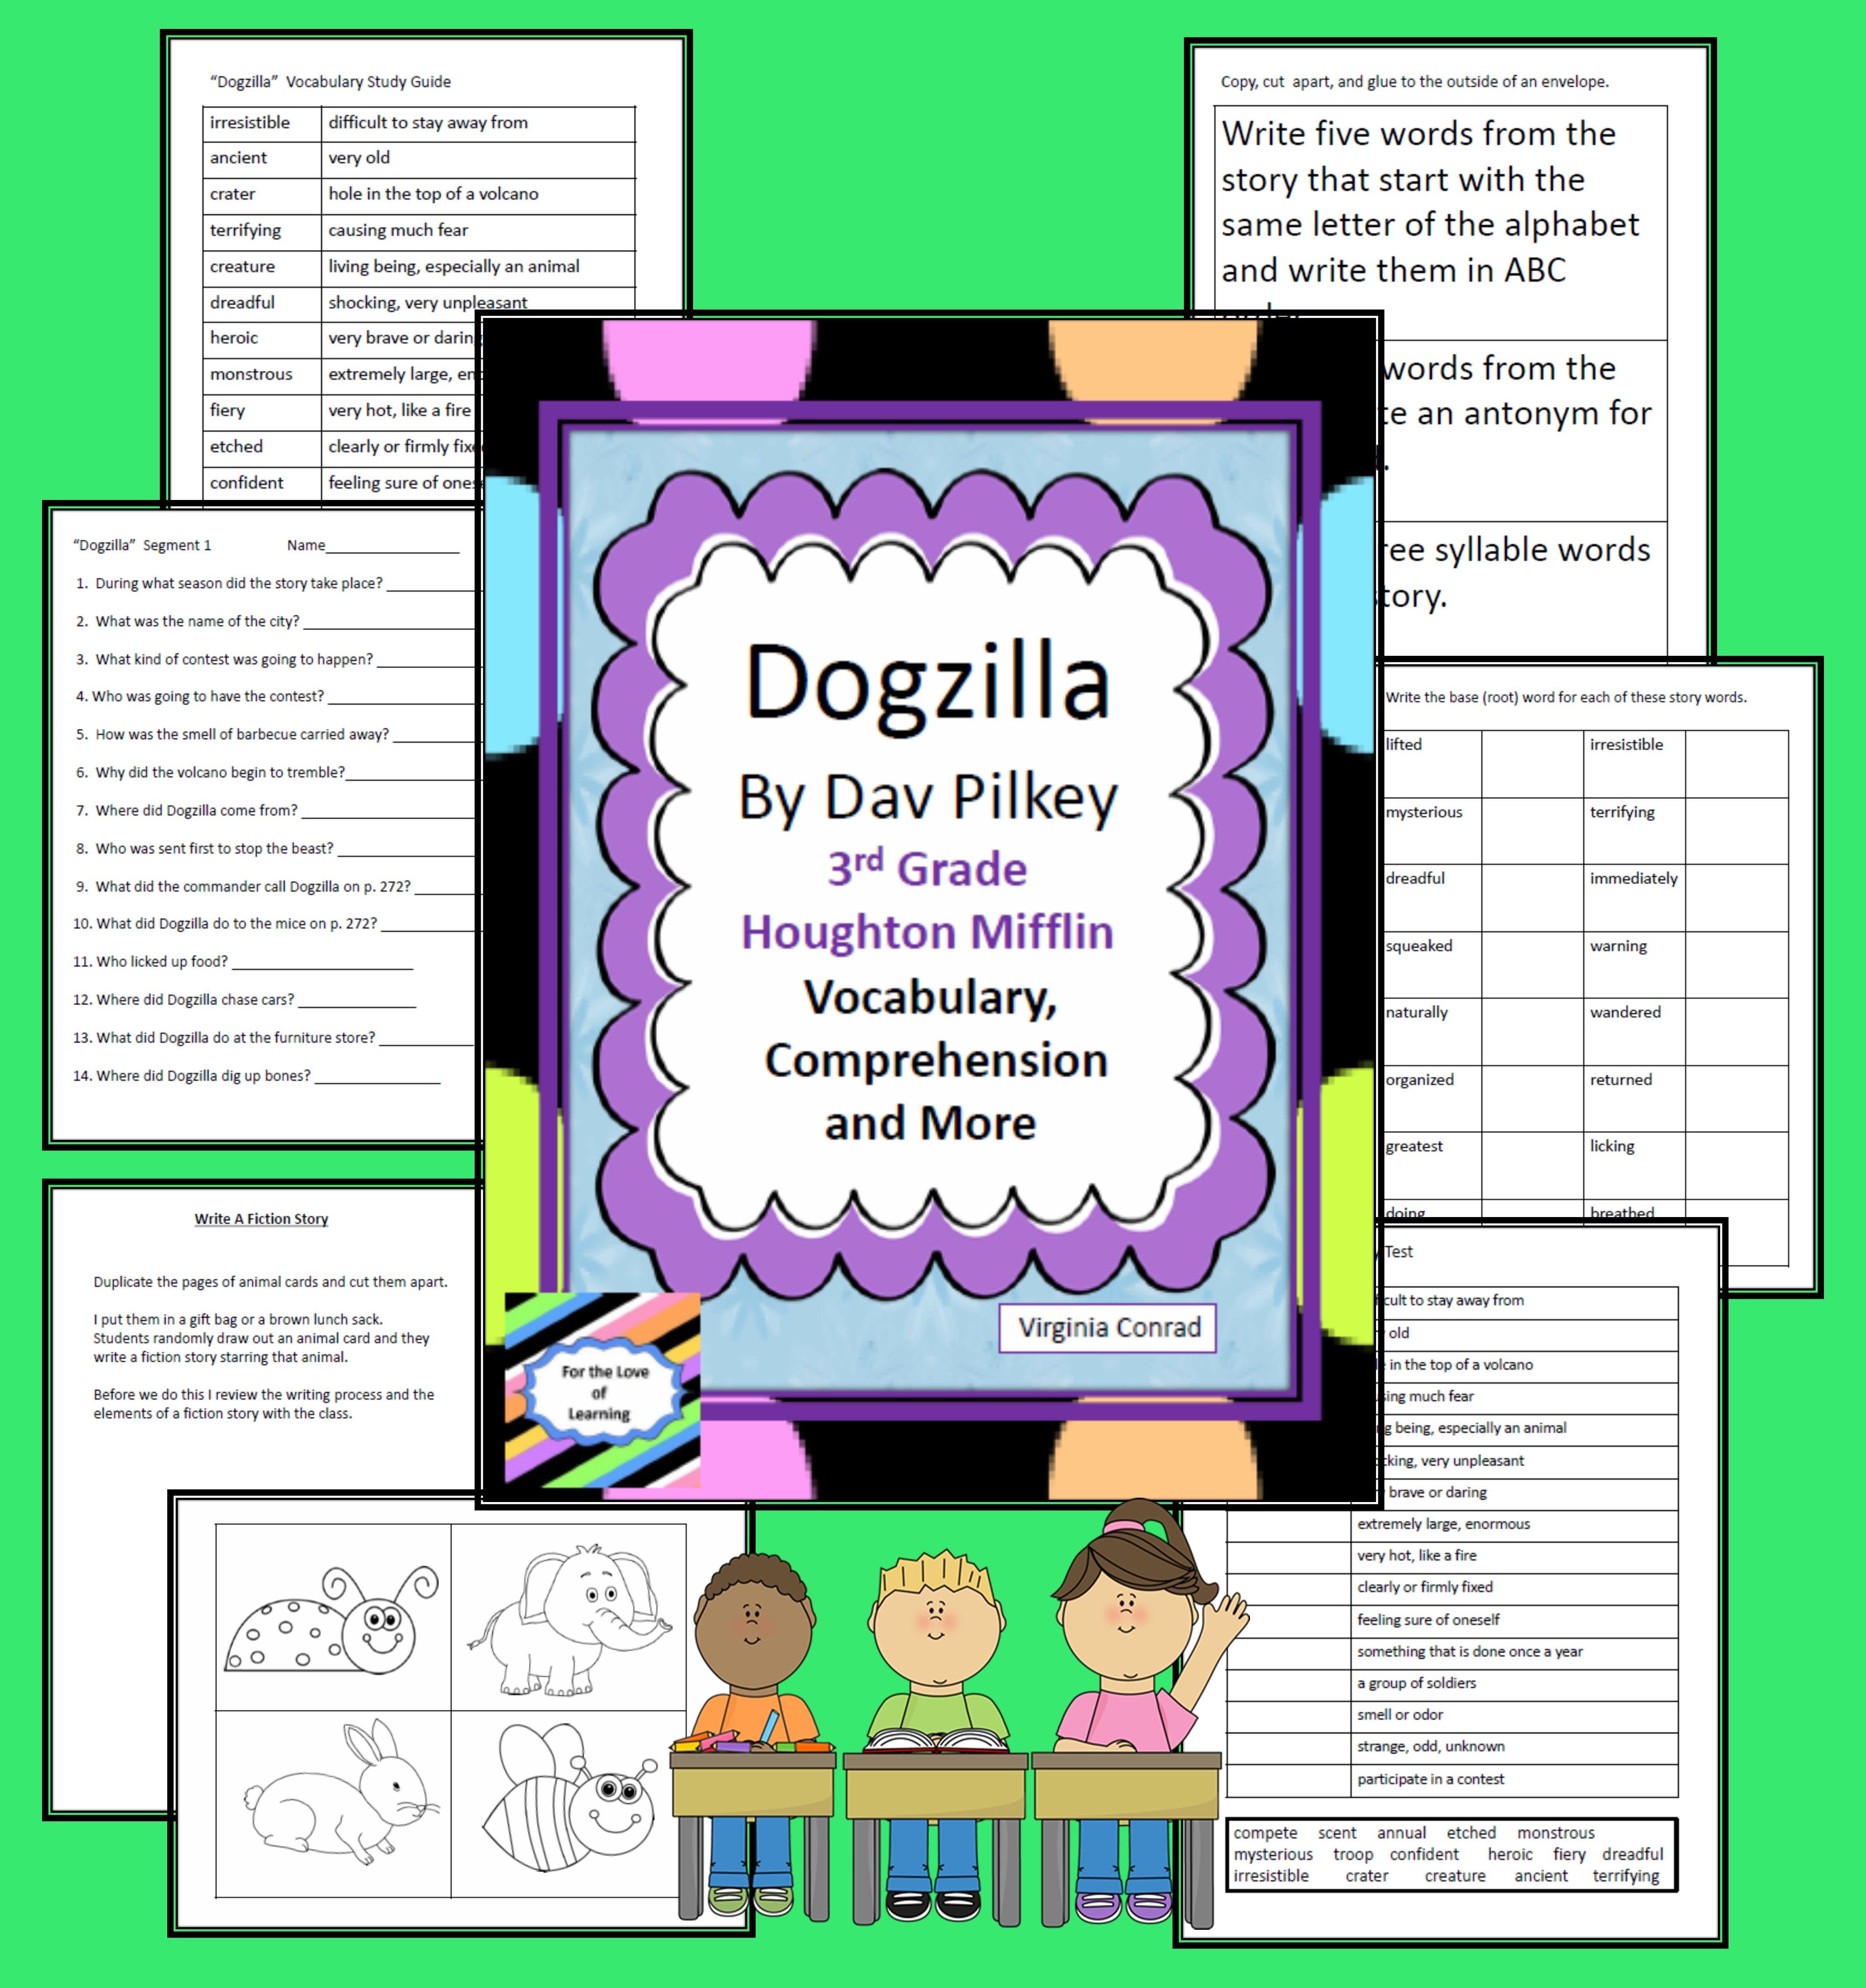 Dogzilla By Dav Pilkey Vocabulary And Comprehension